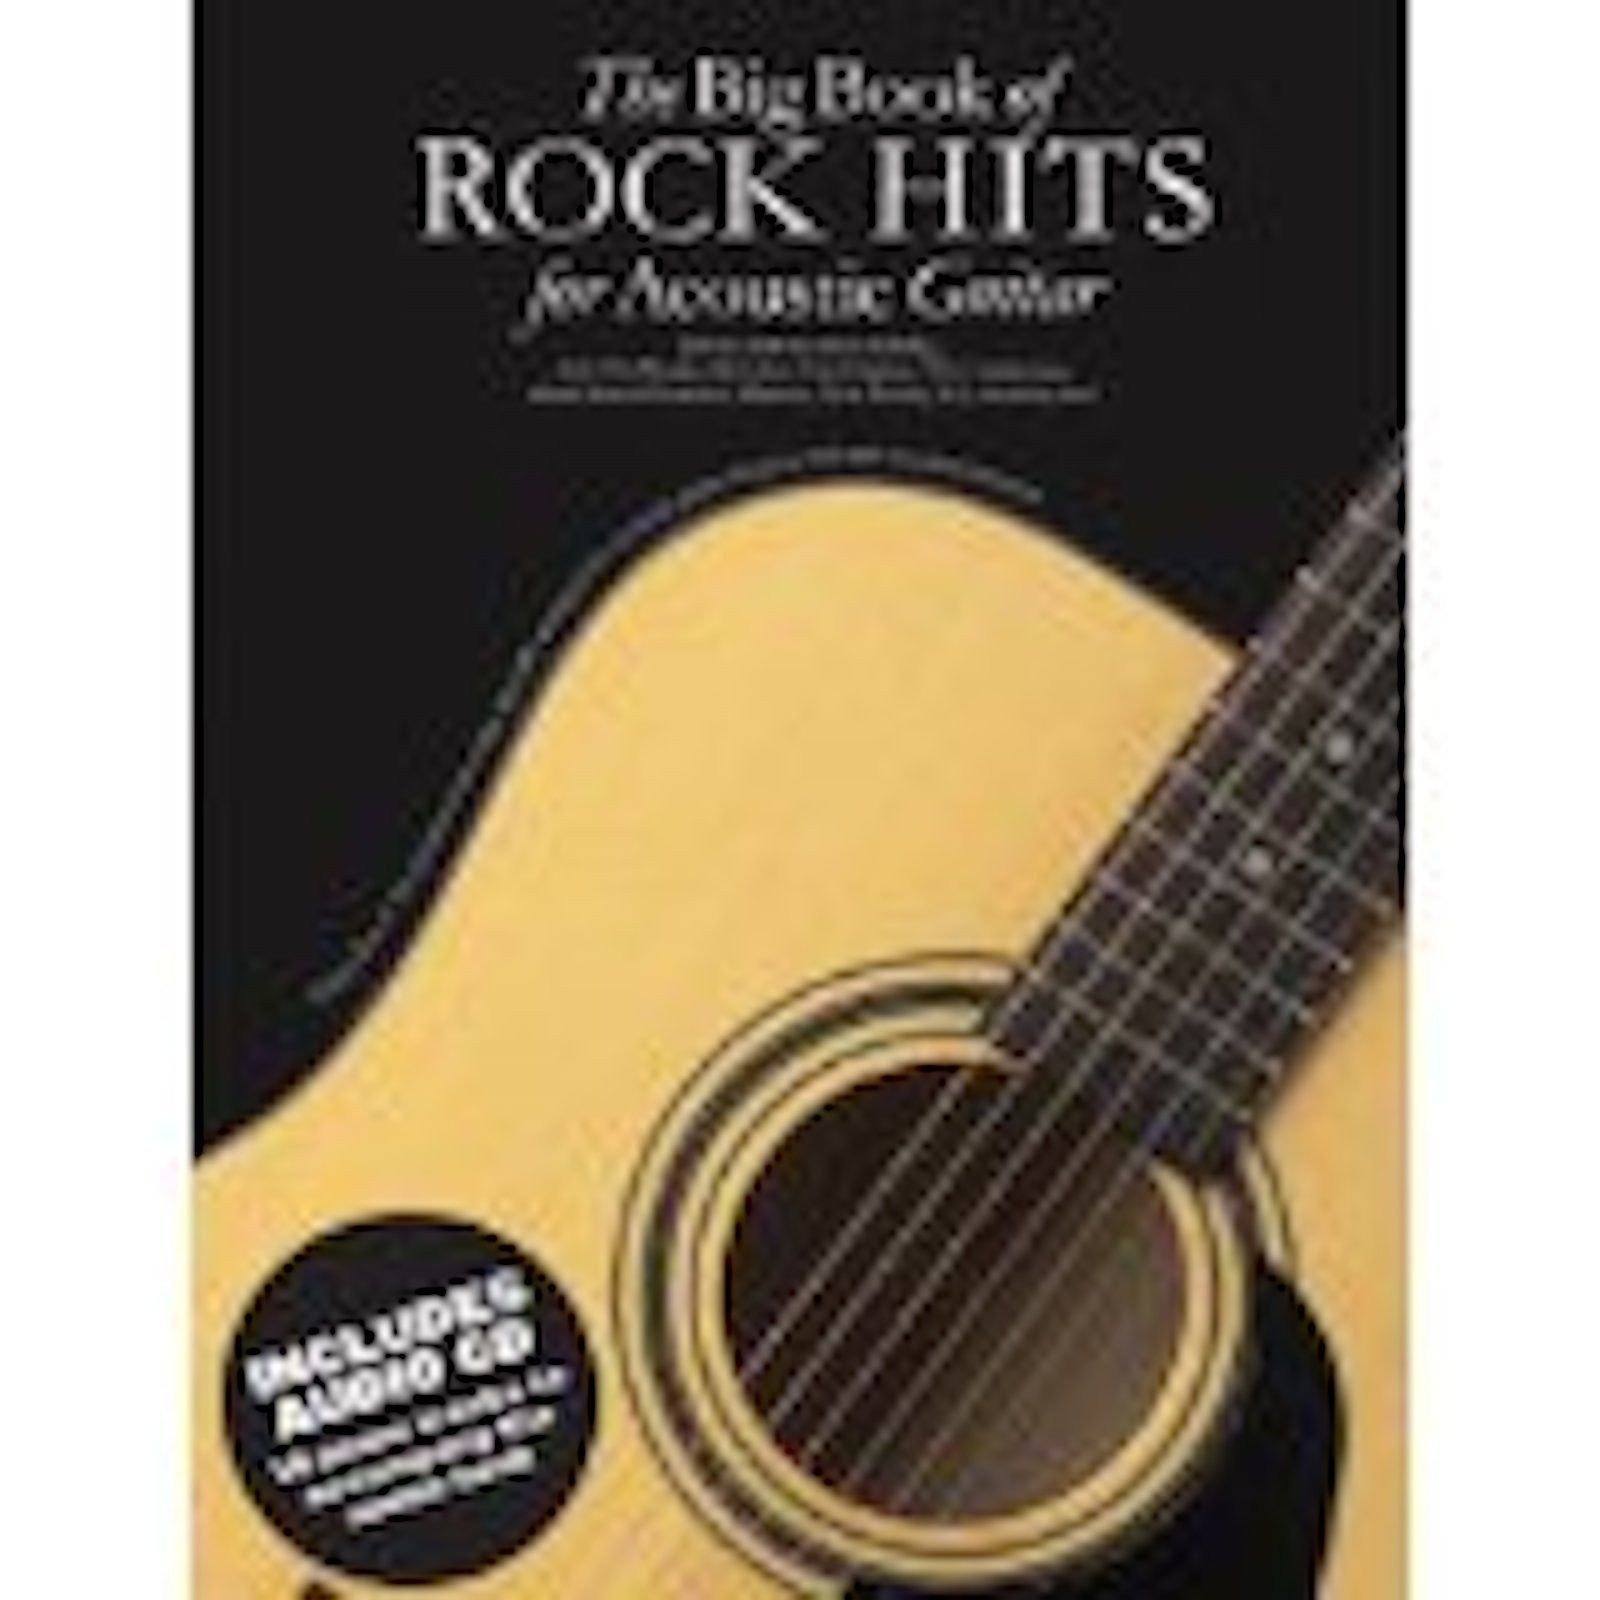 The Big Book Of Rock Hits Acoustic Guitar TAB Anthology Sheet Music CD B47 S67